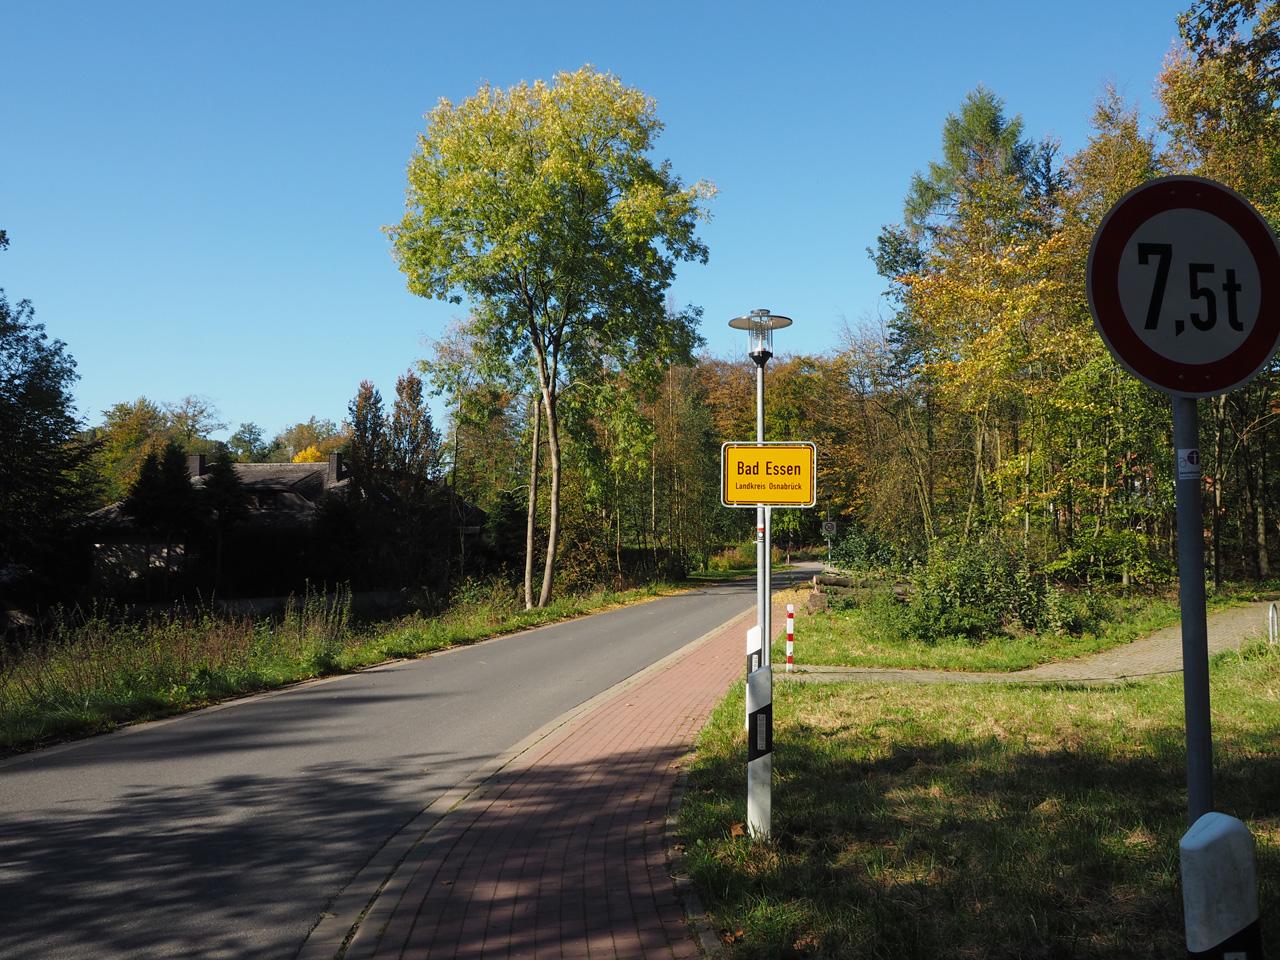 aankomst in Bad Essen